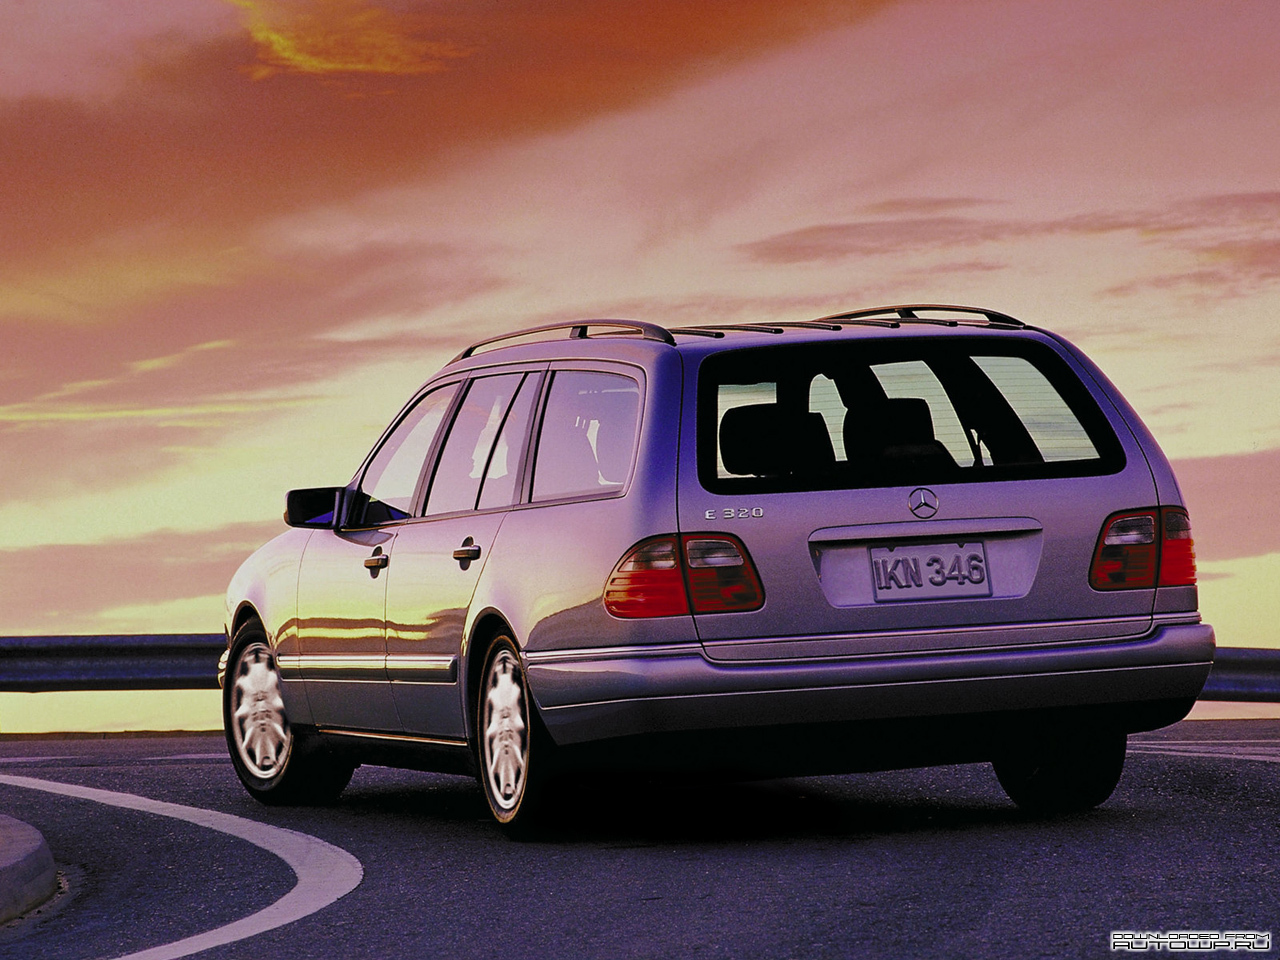 Mercedes benz e class estate s210 picture 76685 for 1999 mercedes benz e320 4matic